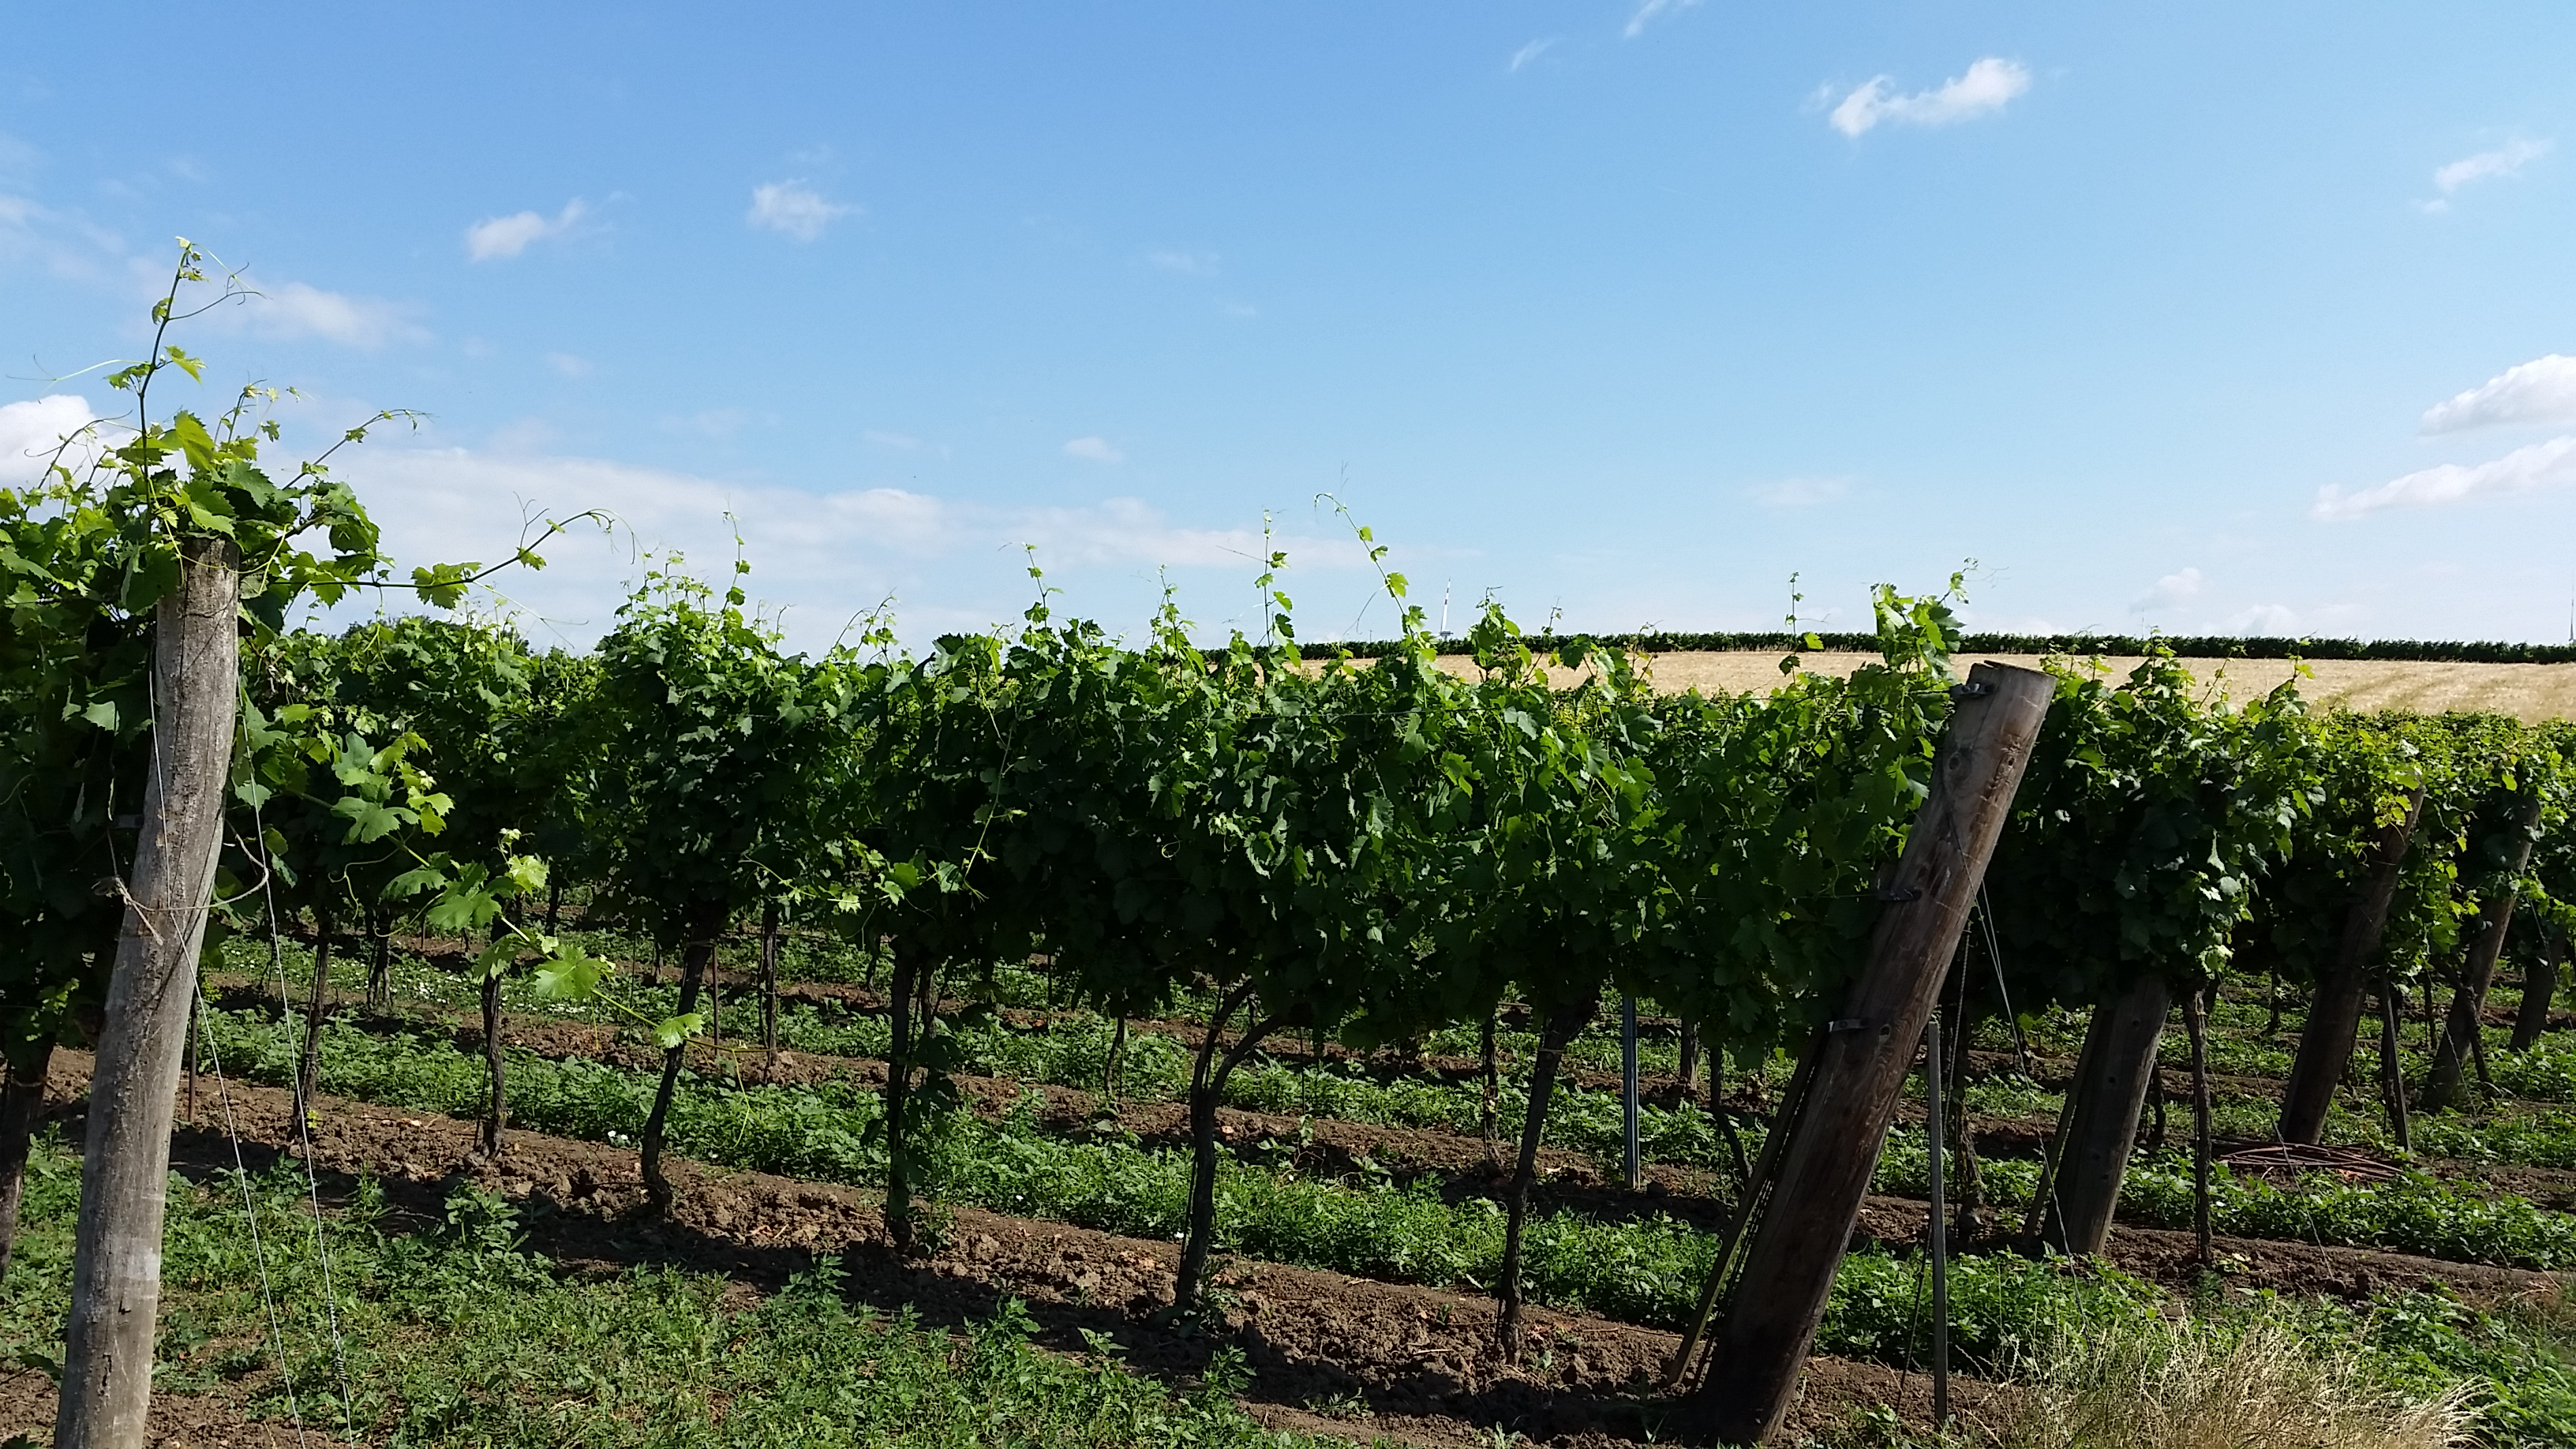 Weinreben bei Ebersdorf